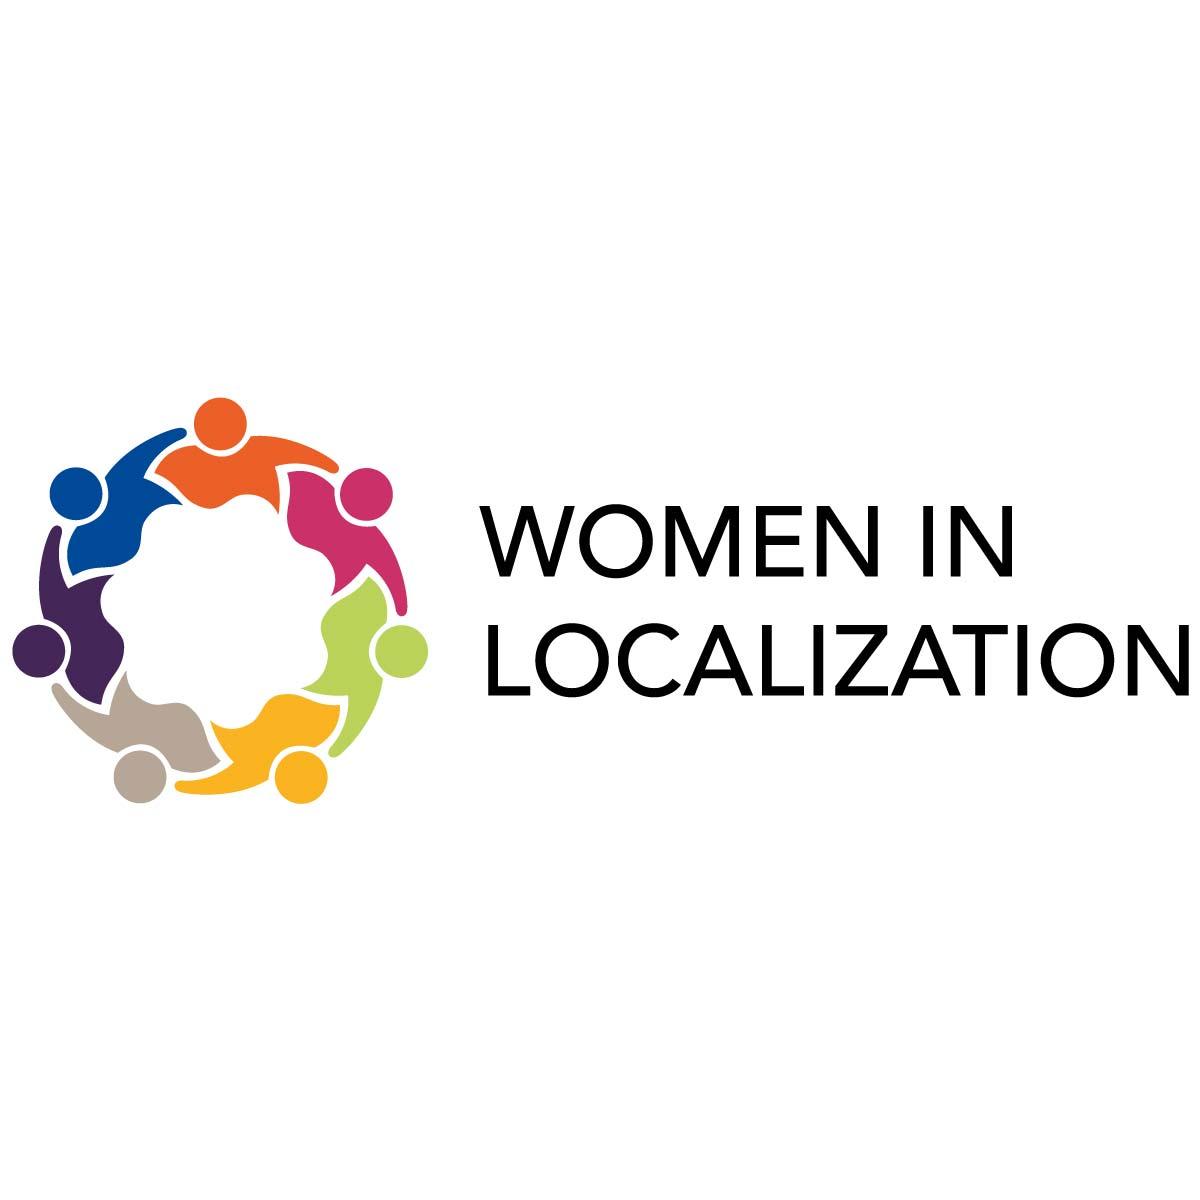 Welcome to Women in Localization - Women in Localization